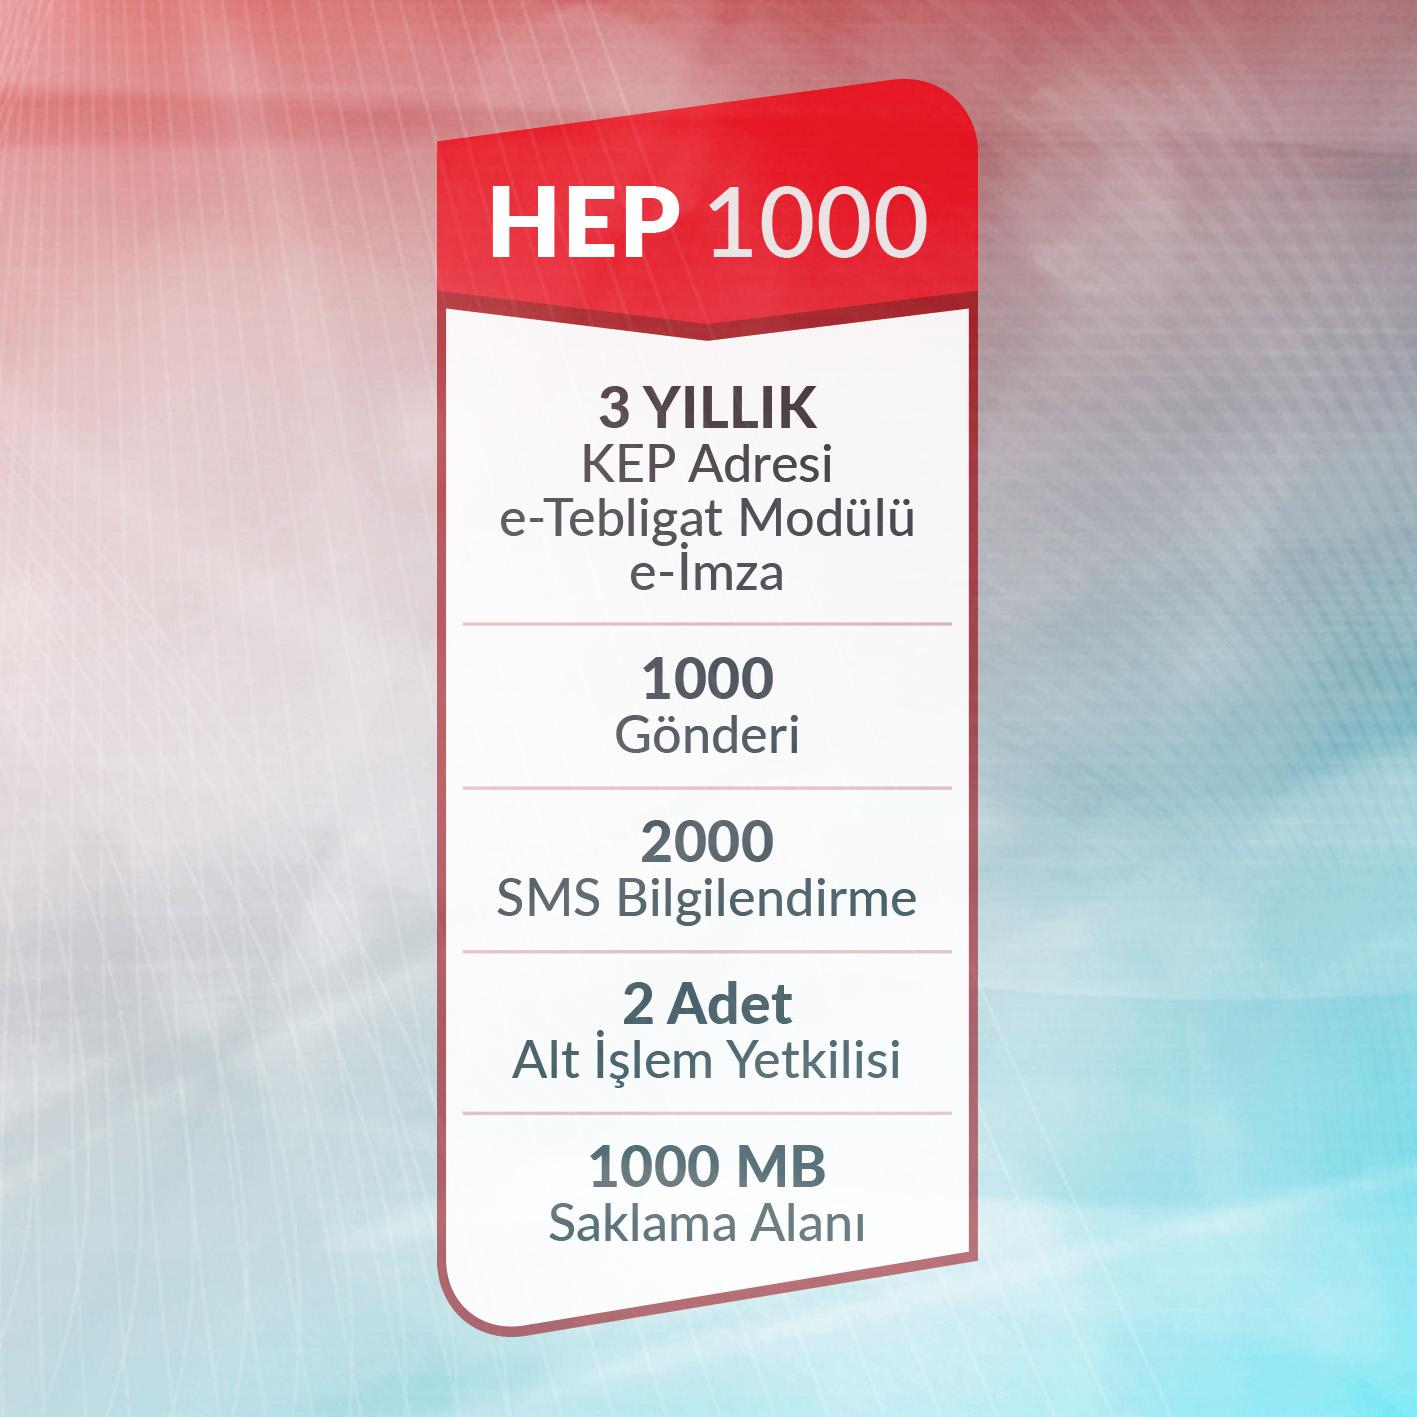 e-Tebligat Hepsi Bir Arada HEP1000 Paketi